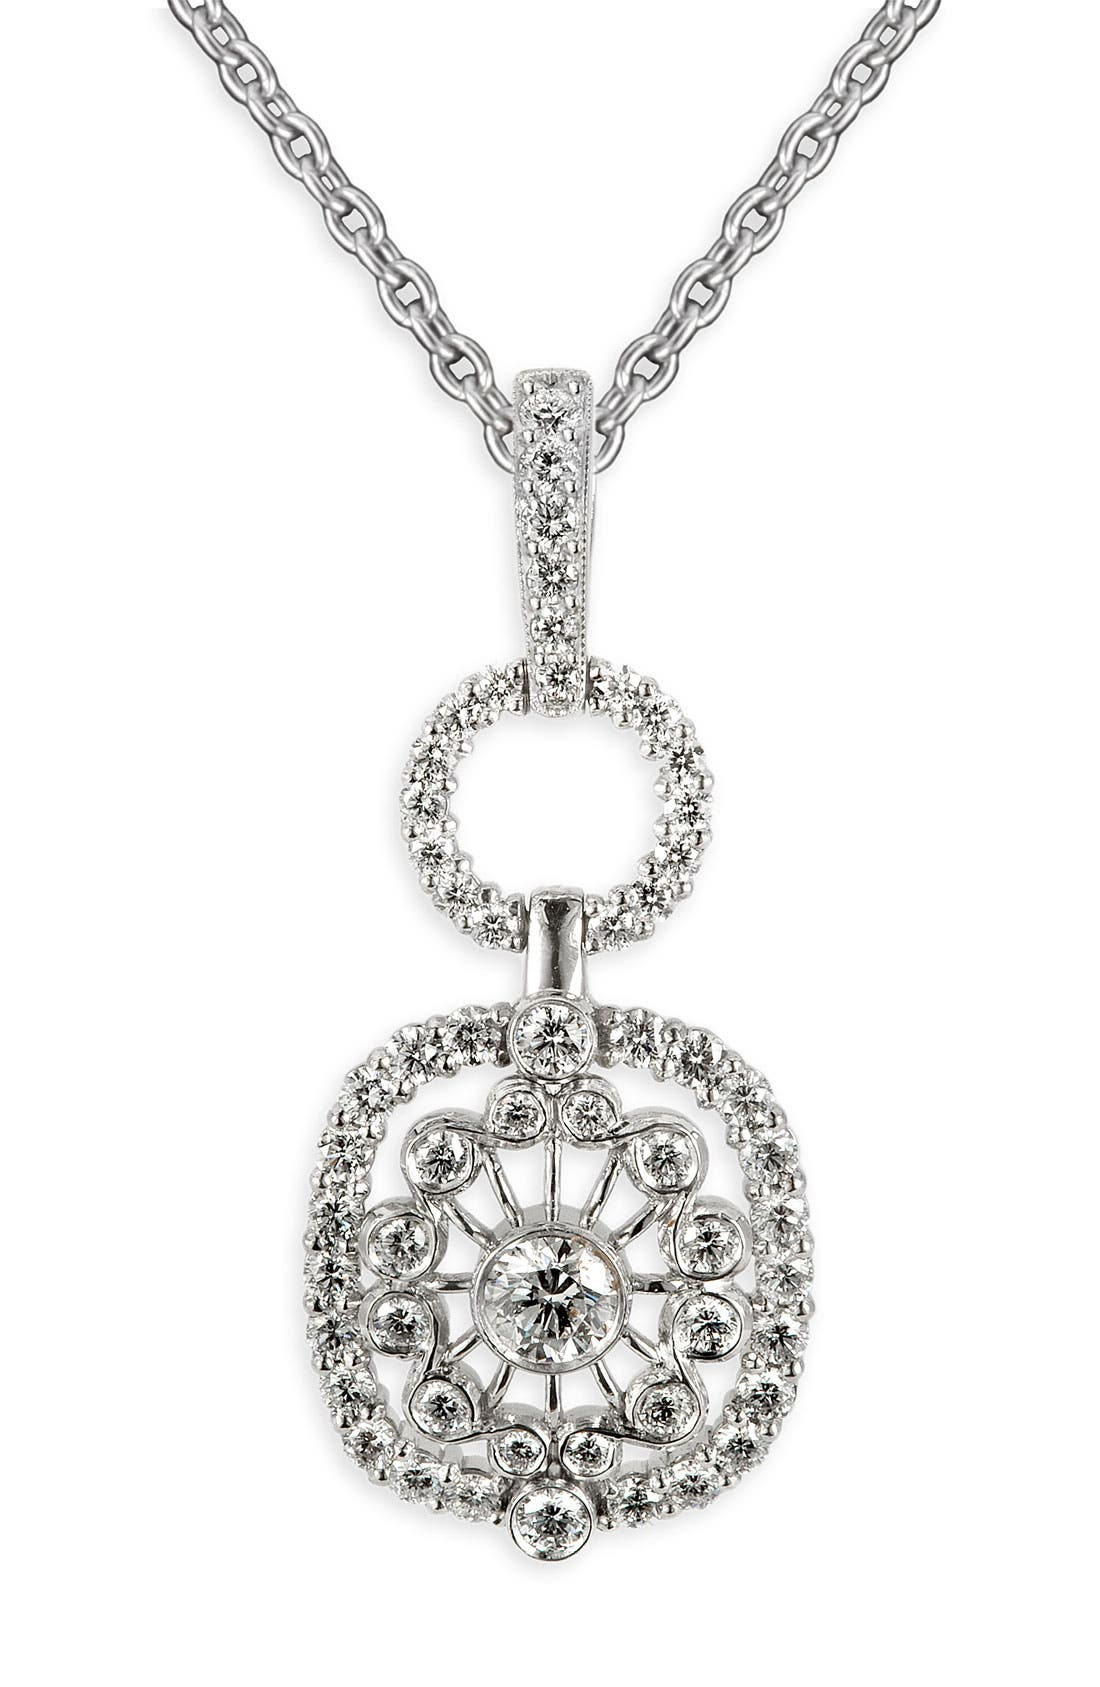 Alternate Image 1 Selected - Jack Kelége 'Byzantine' Diamond Pendant Necklace